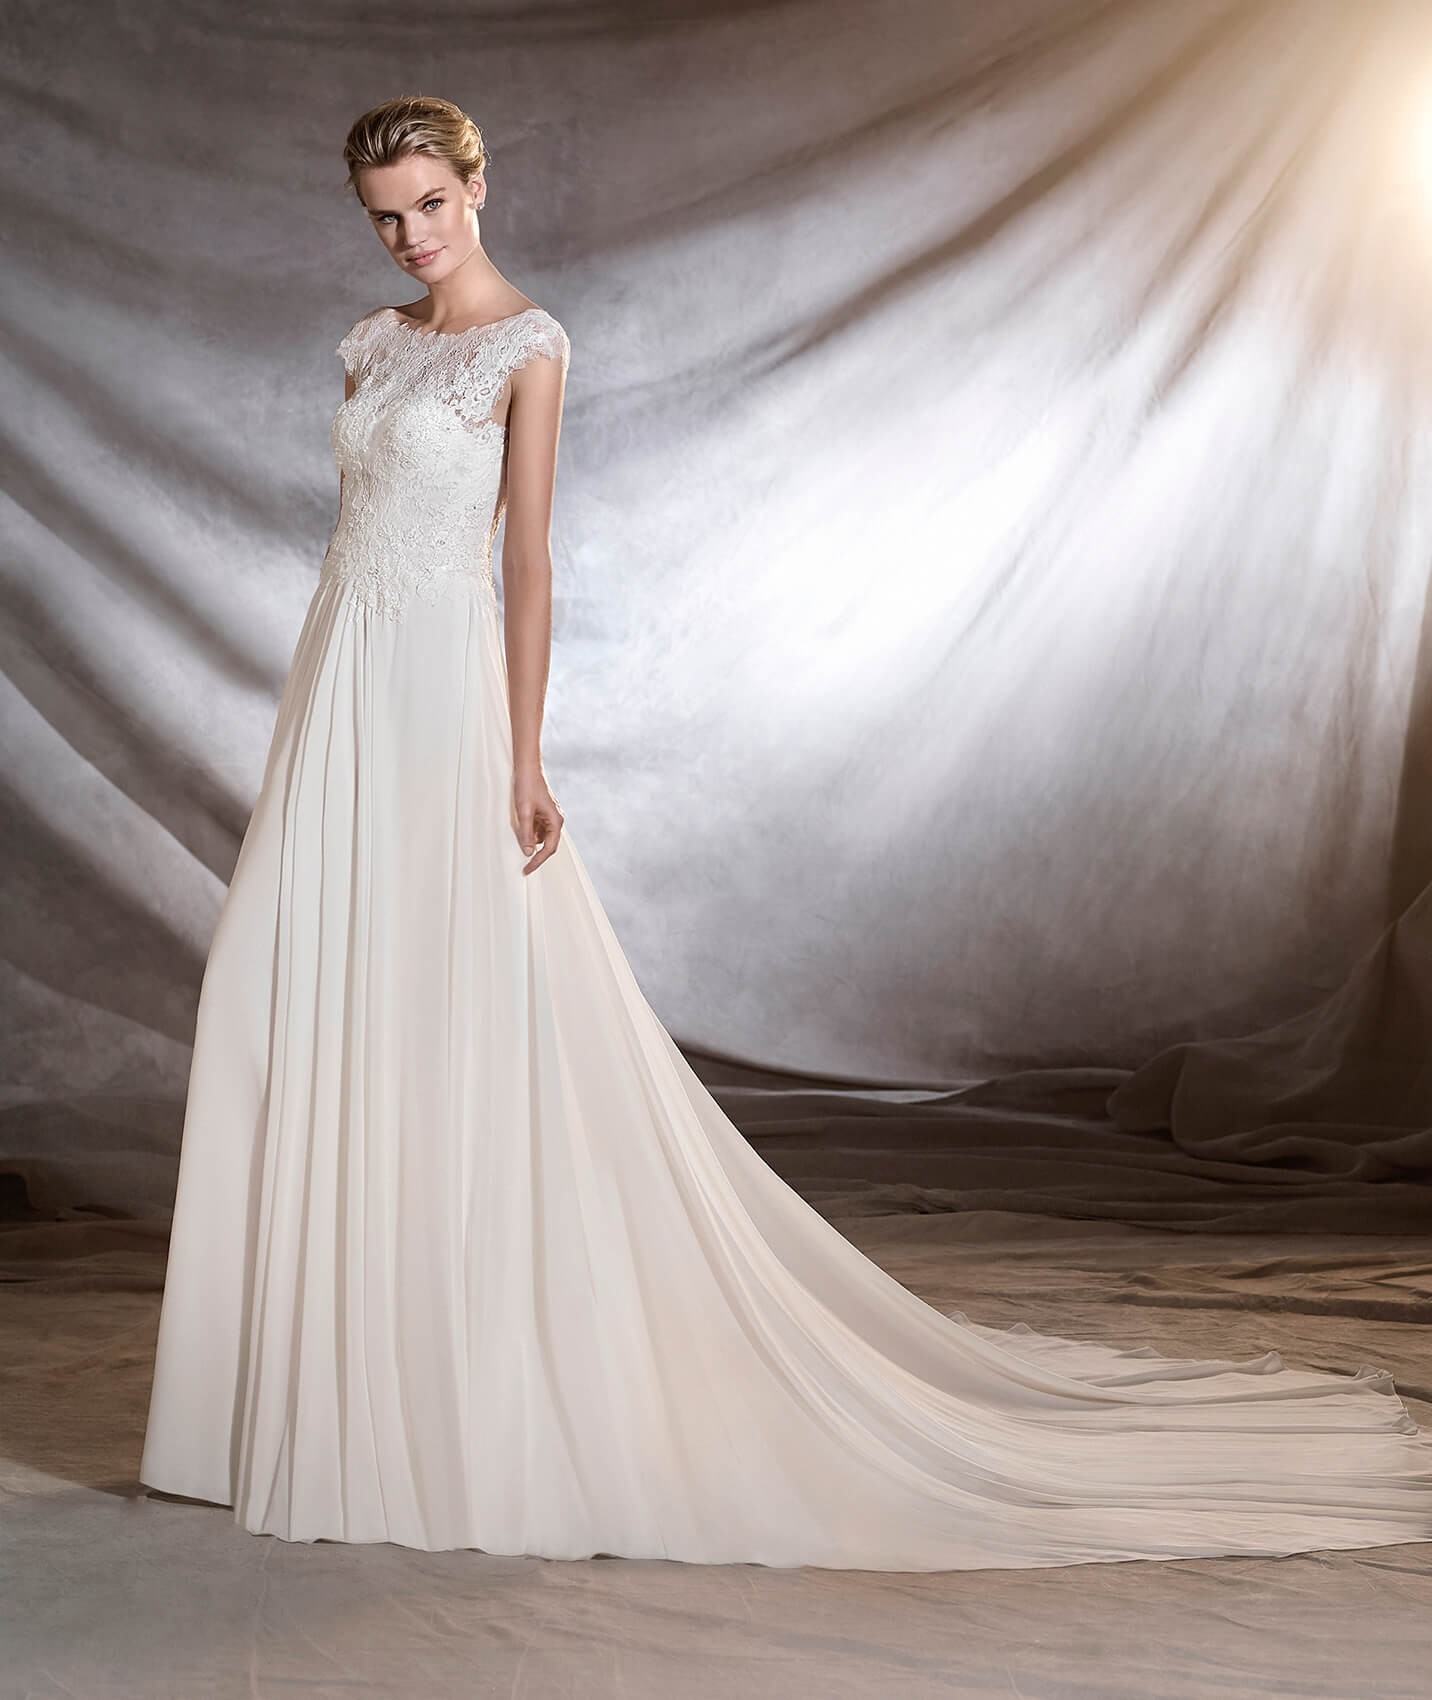 Orsini vestuvinė suknelė